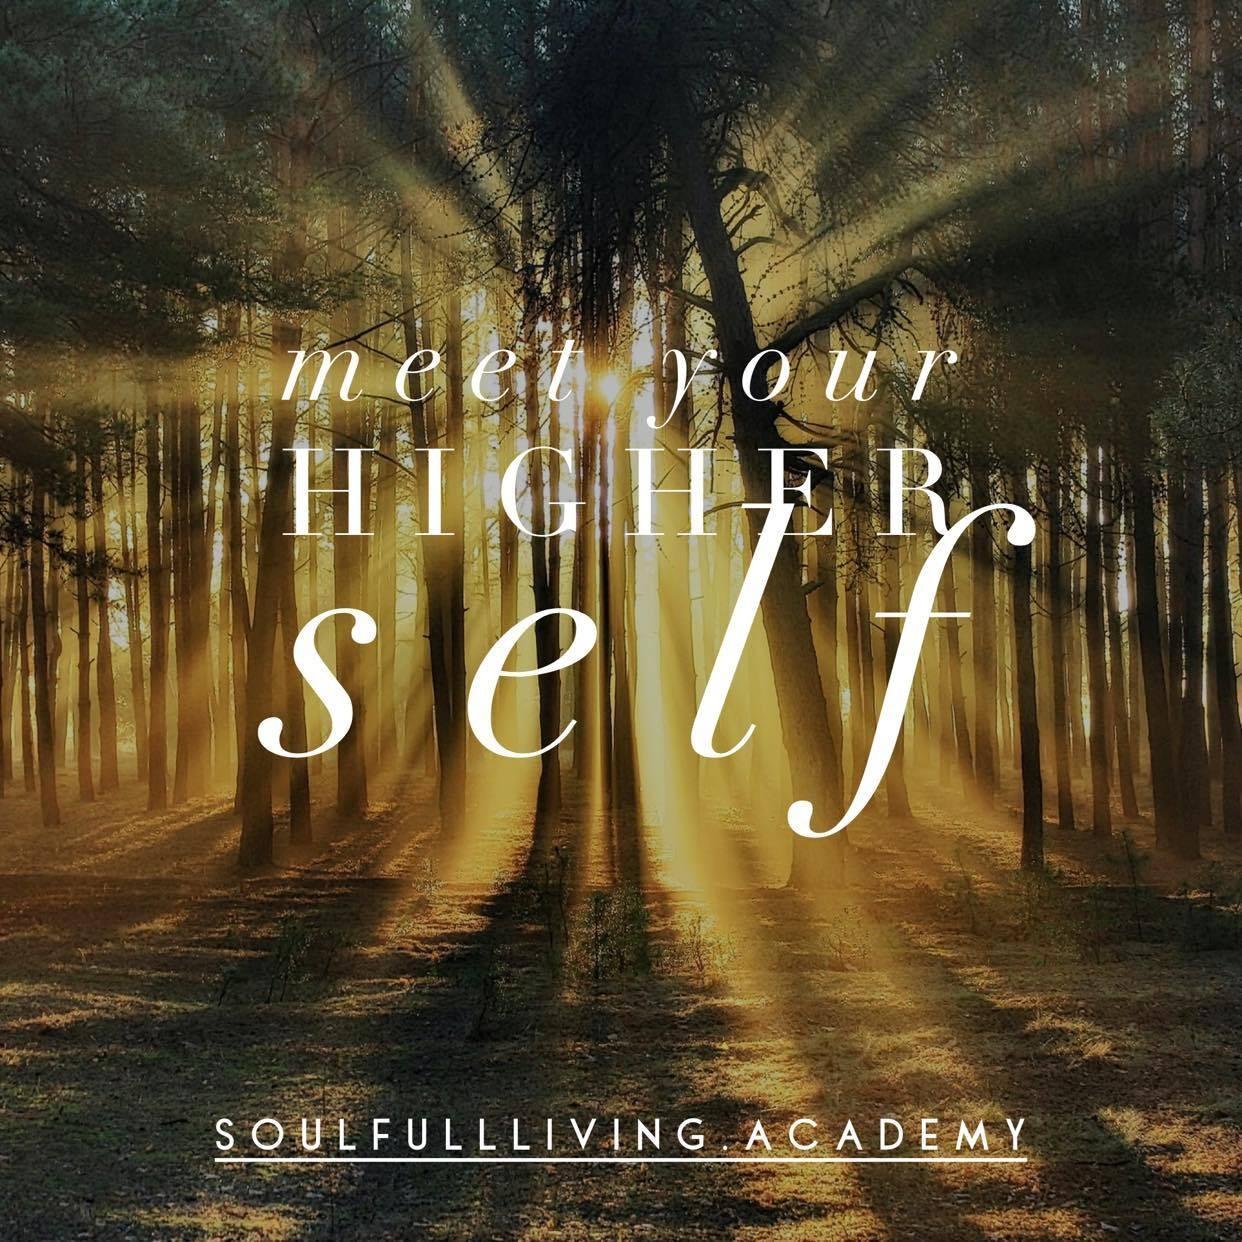 Meet your higher self image